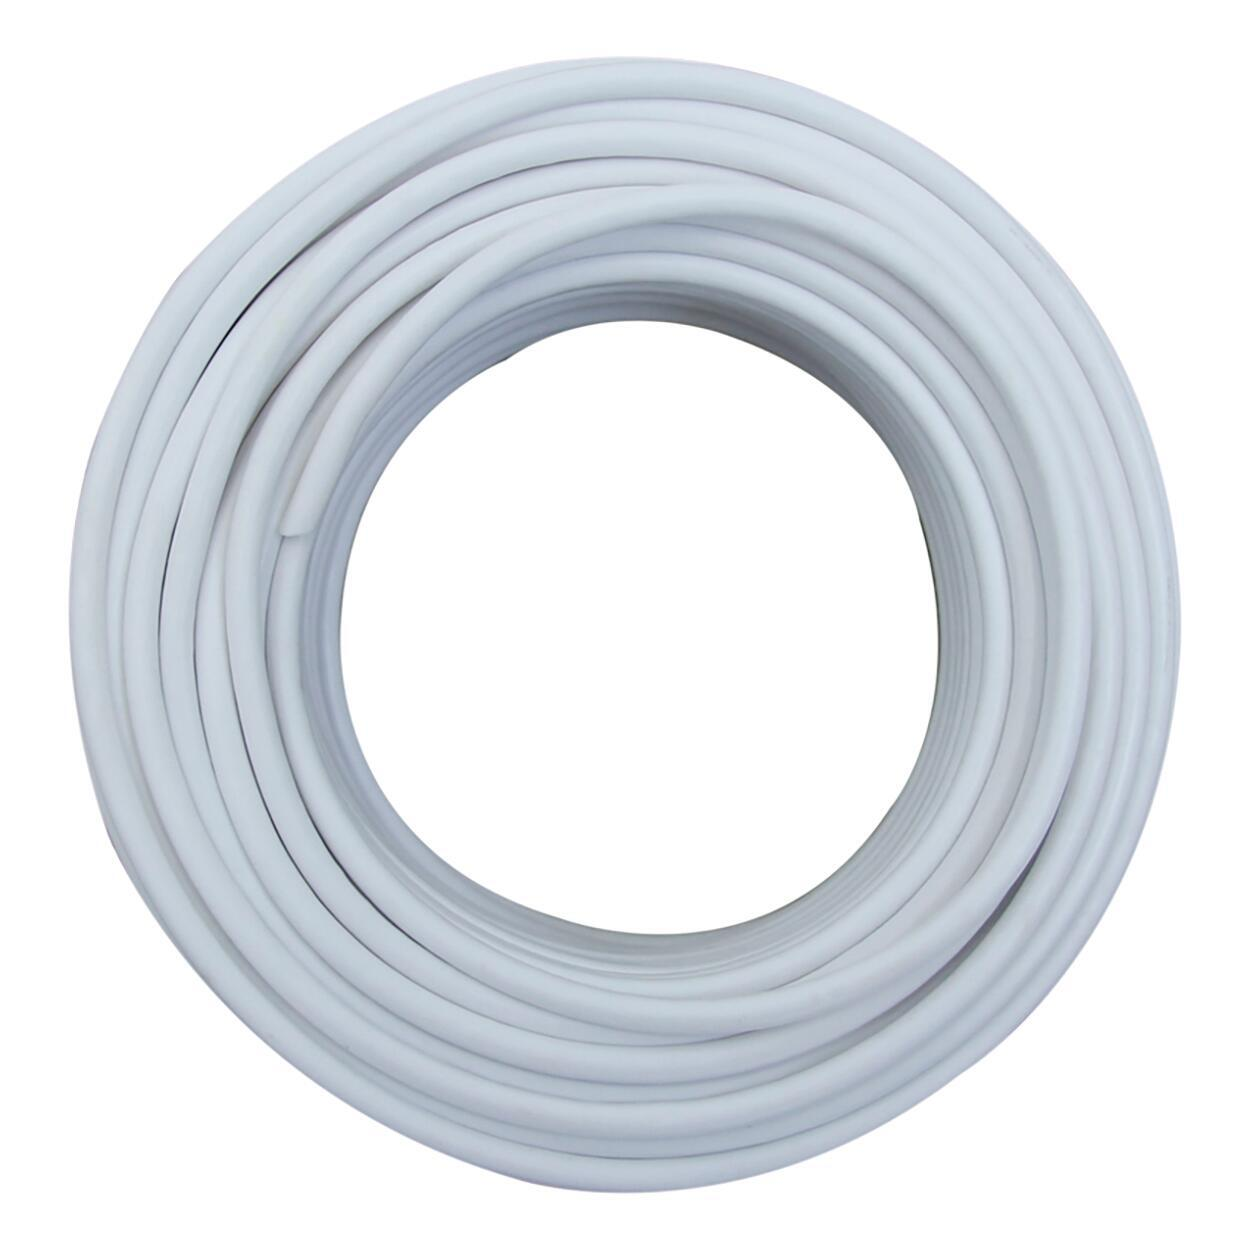 Cavo elettrico bianco H03VVH2-F 2 fili x 0,75 mm² 5 m LEXMAN Matassa - 3